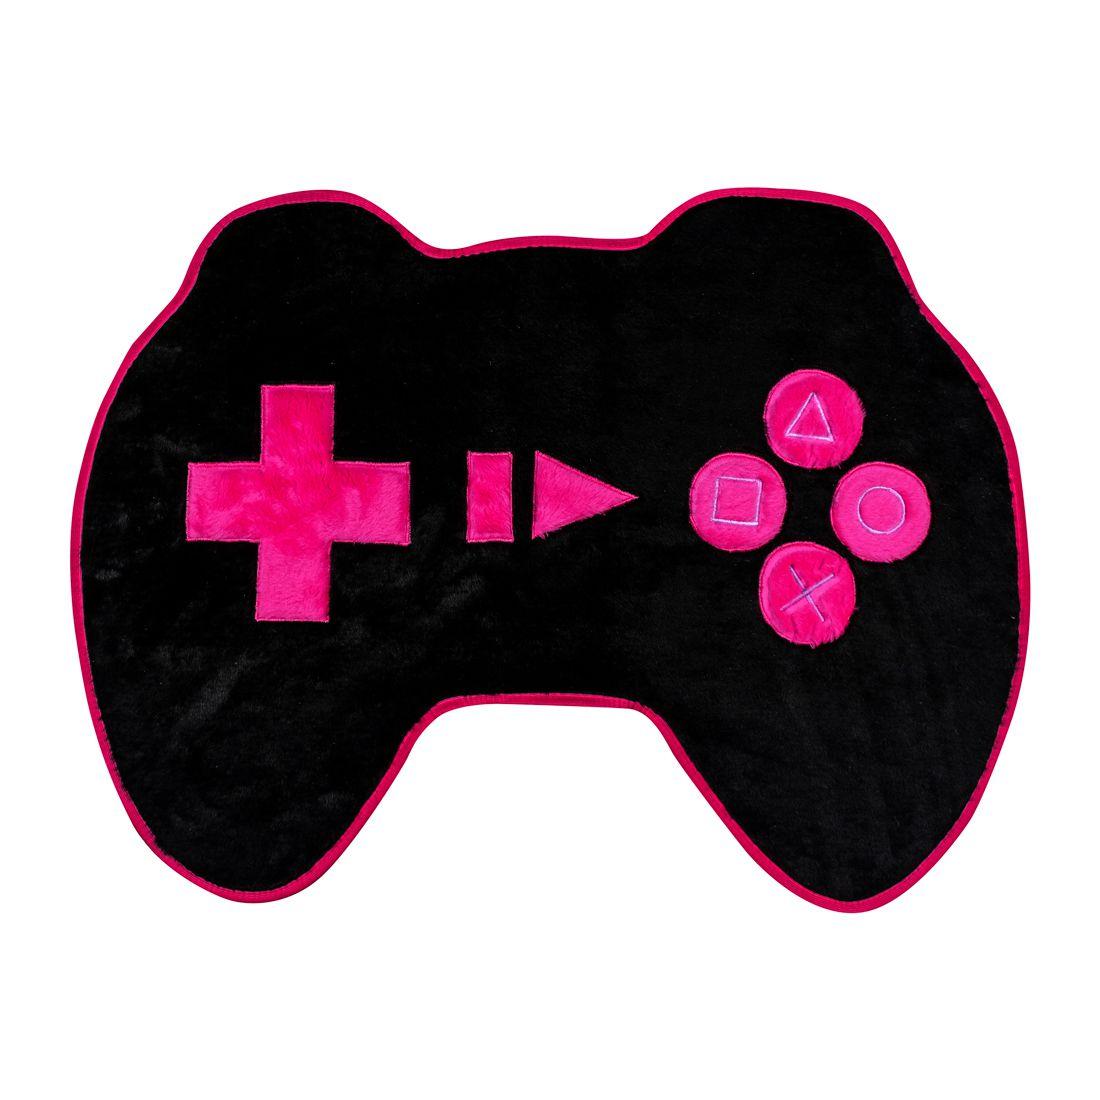 Tapete Infantil Premium Formato Controle Preto/Pink 76cm x 56cm